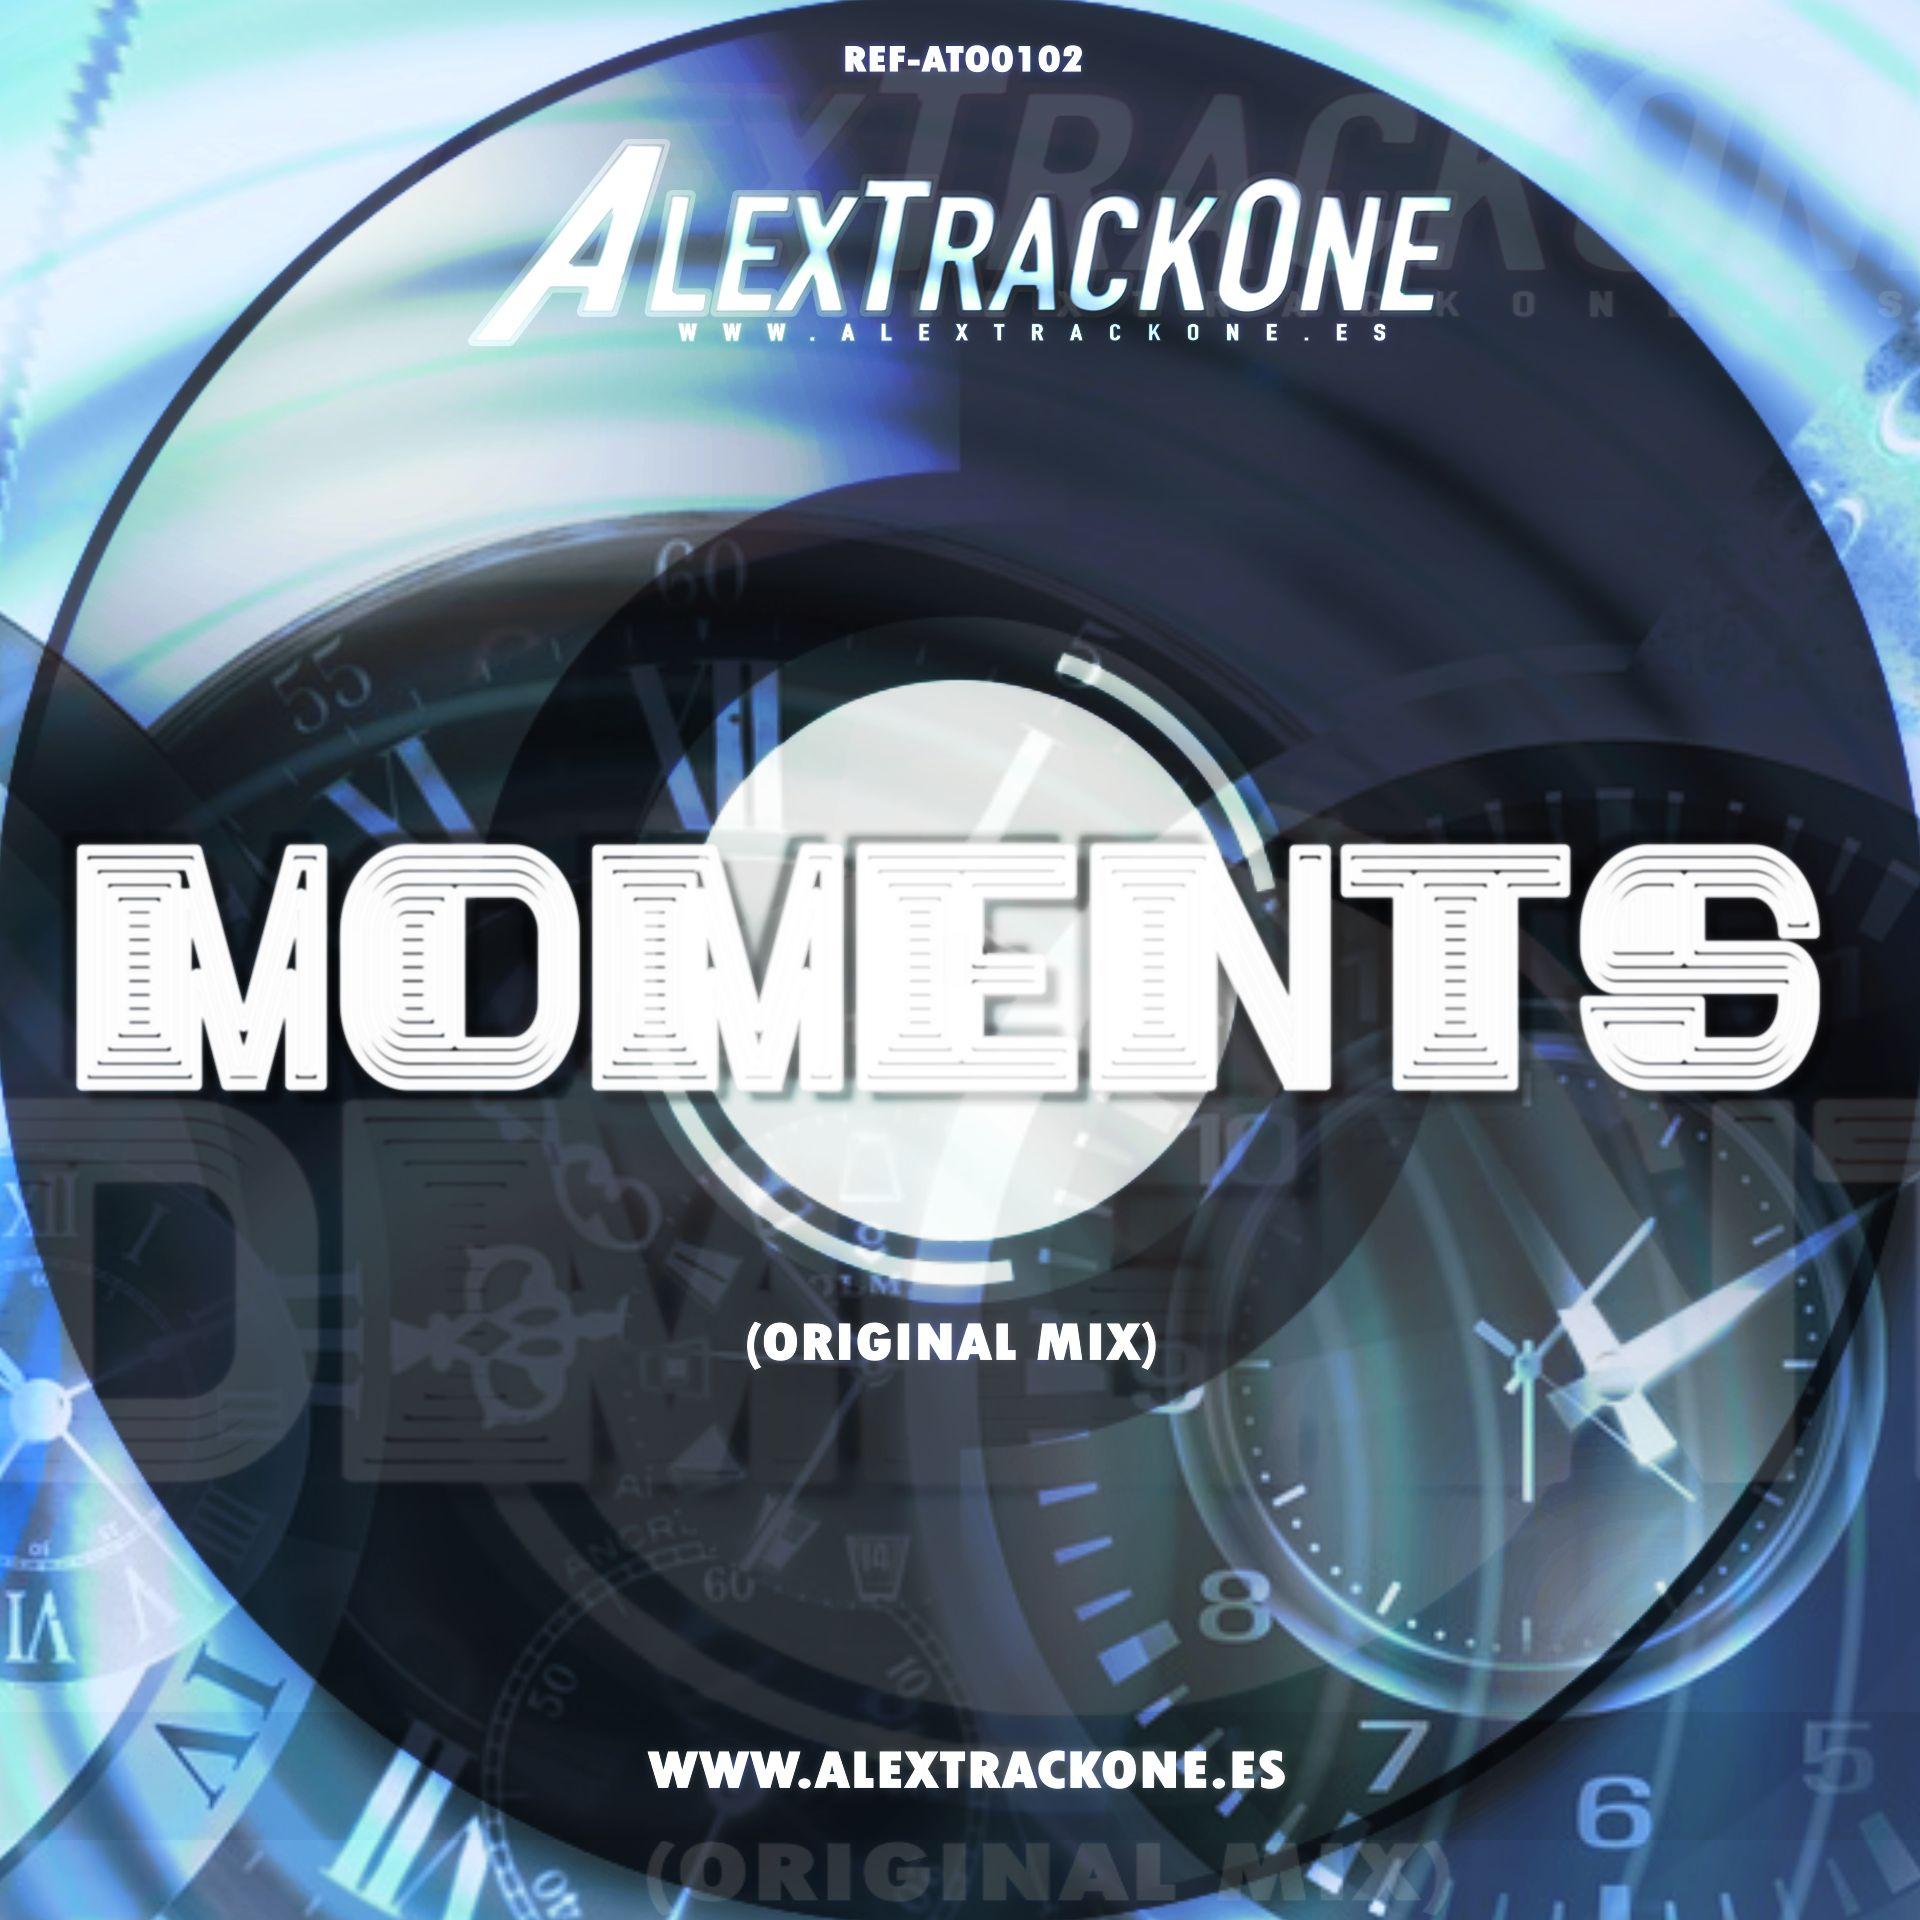 REF-ATO0102 MOMENTS (ORIGINAL MIX) (MP3 & WAV & FLAC)